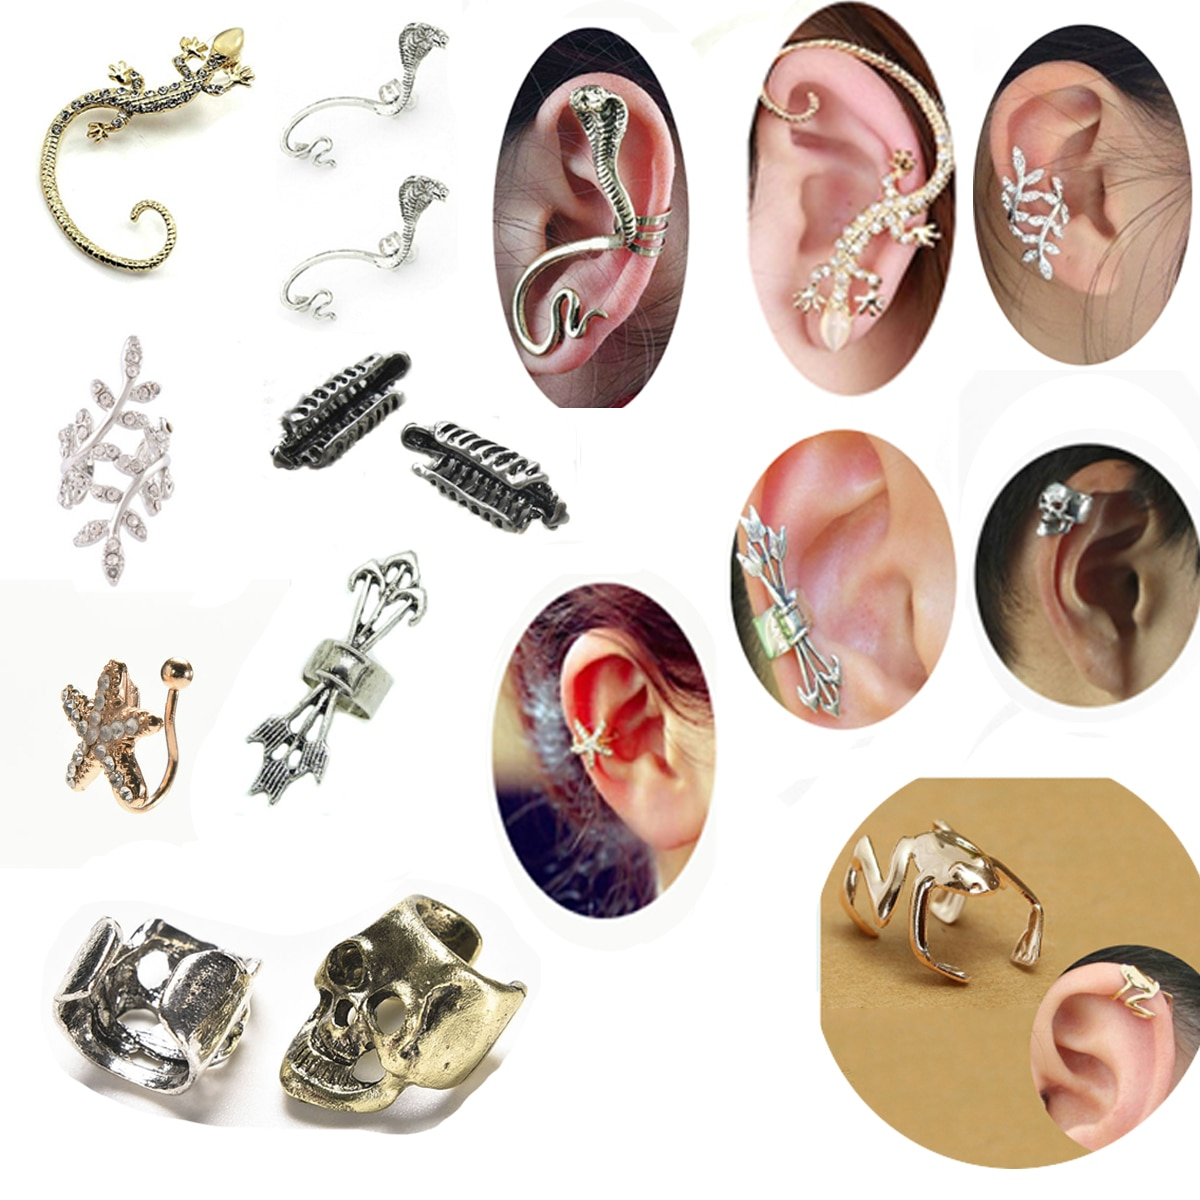 1 Pza Unisex Punk diseño sencillo plateado Color esqueleto dedo clip de oreja de mano oreja manguito